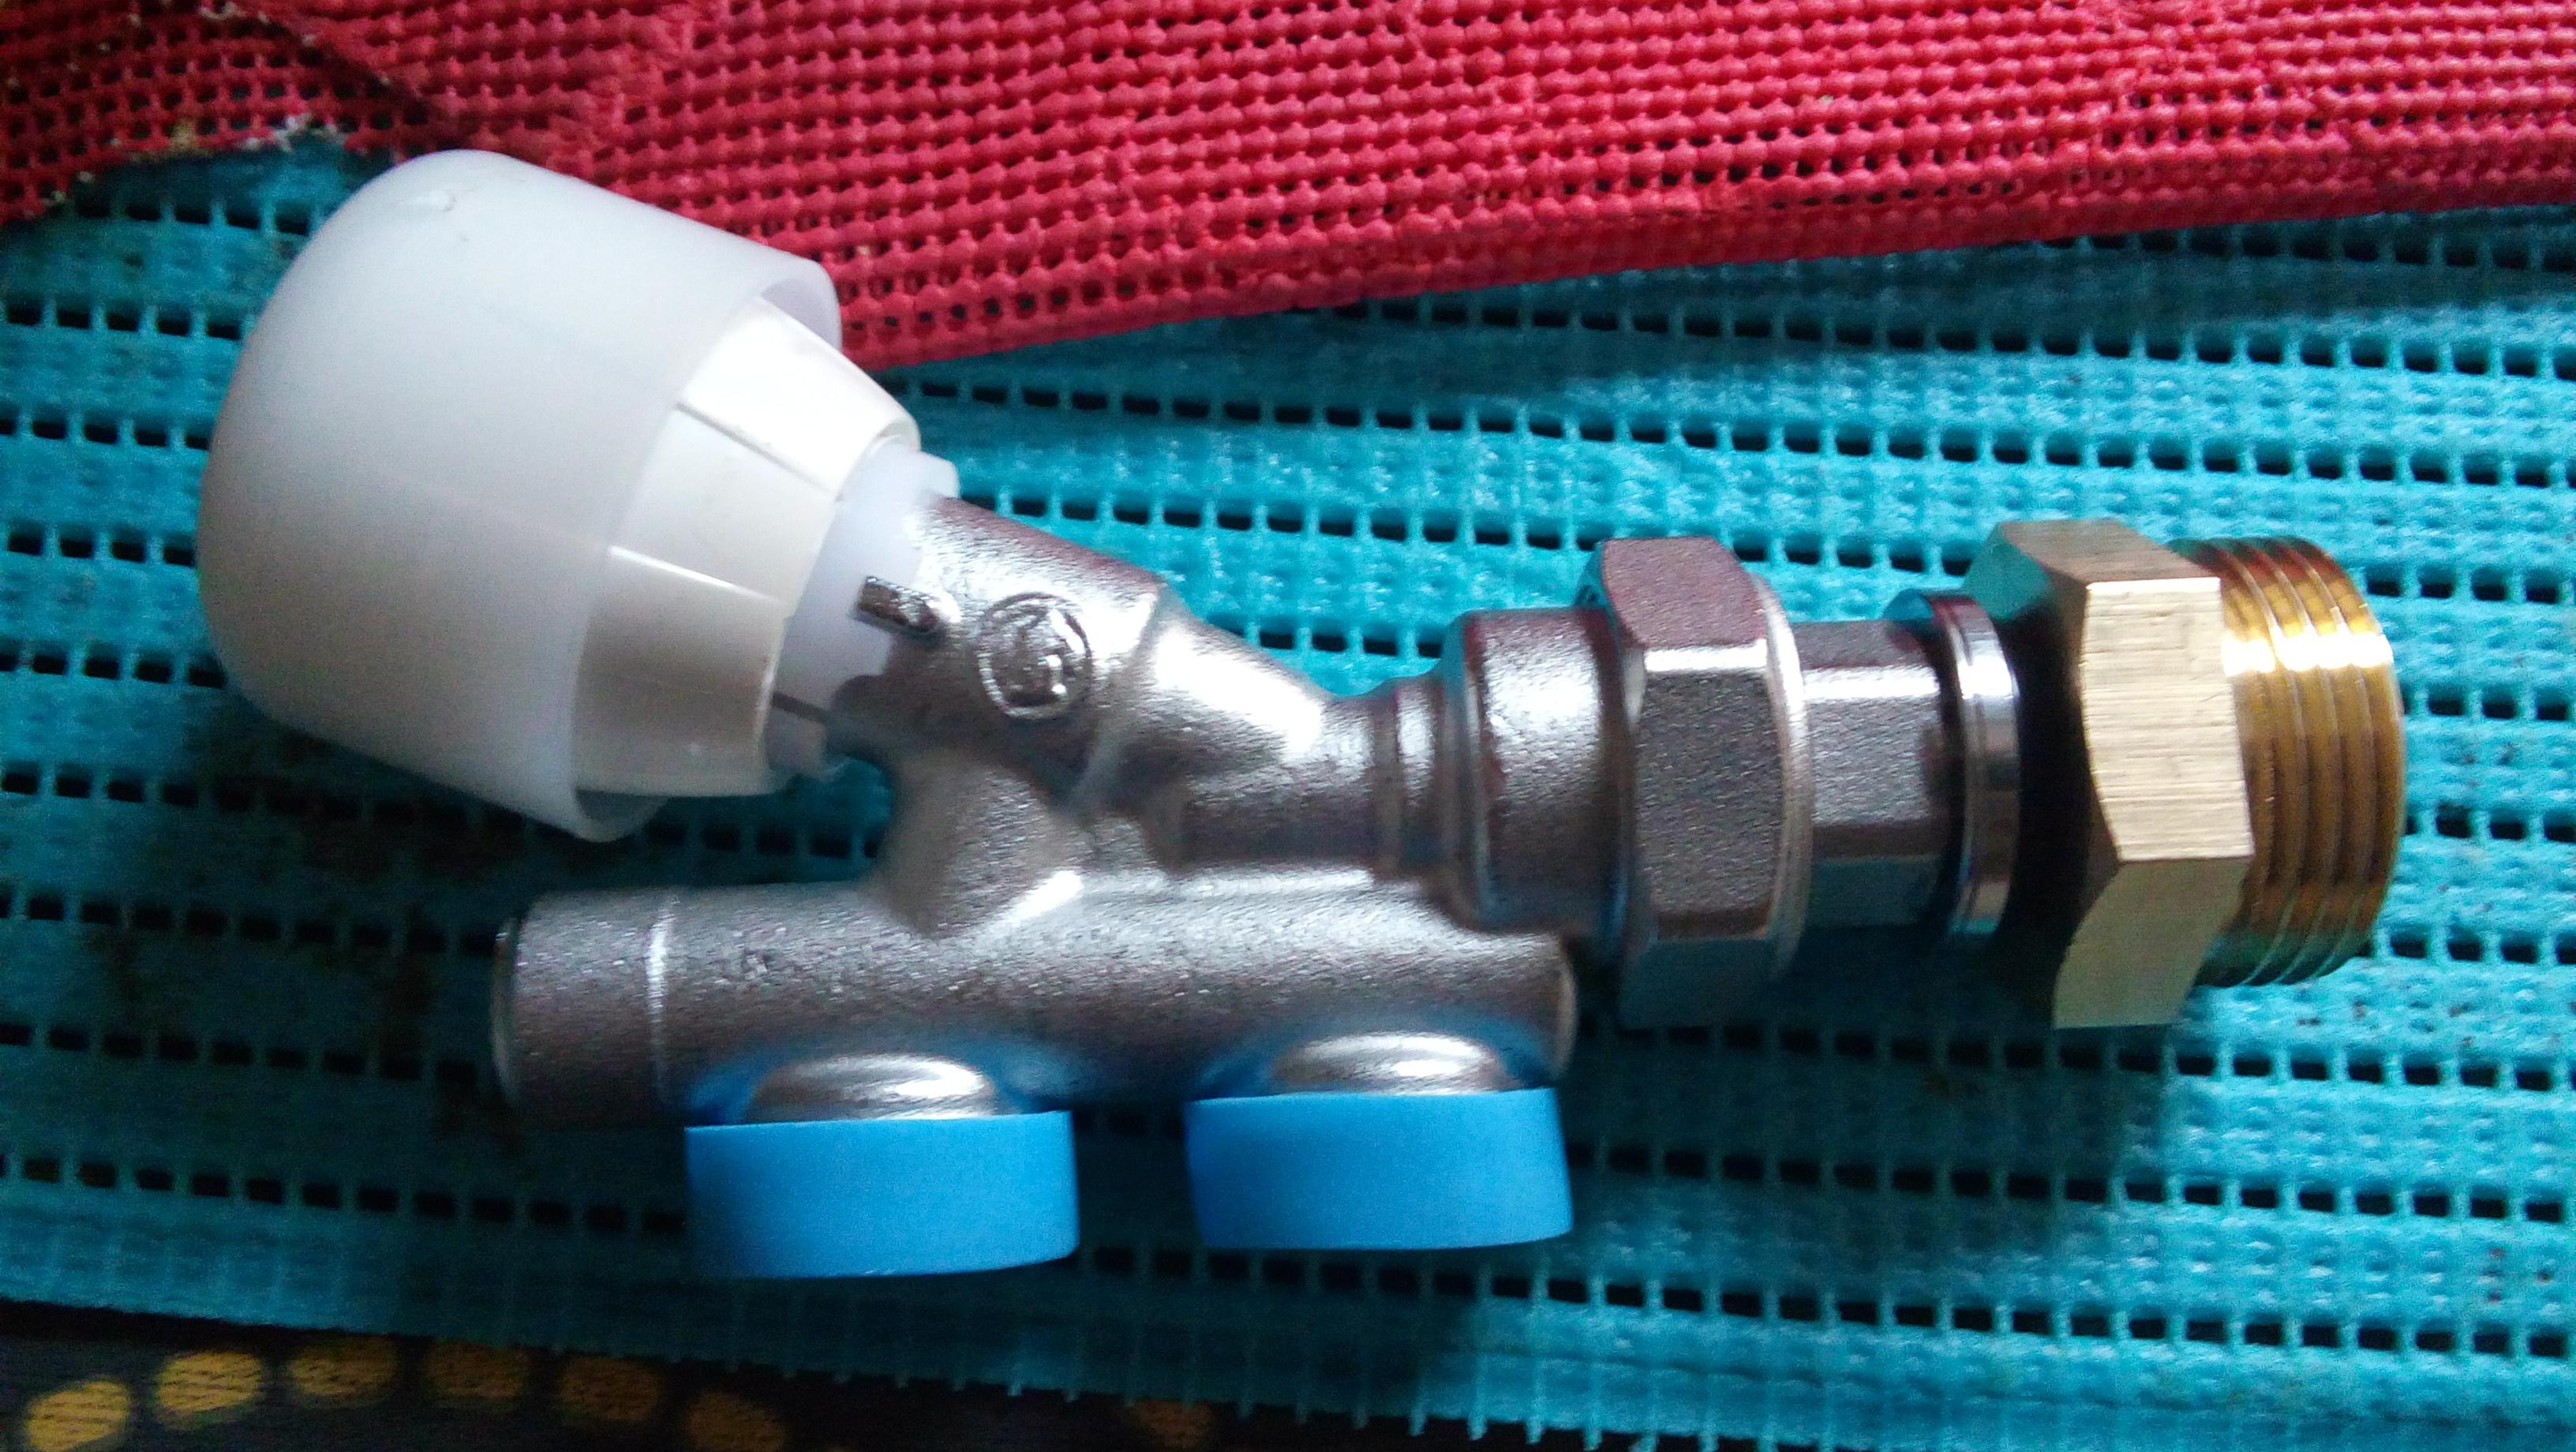 montage actuelle robinet R437 NX031 + raccord femelle 15-21 - mâle 26-34.jpg, 2.17 mb, 3264 x 1840